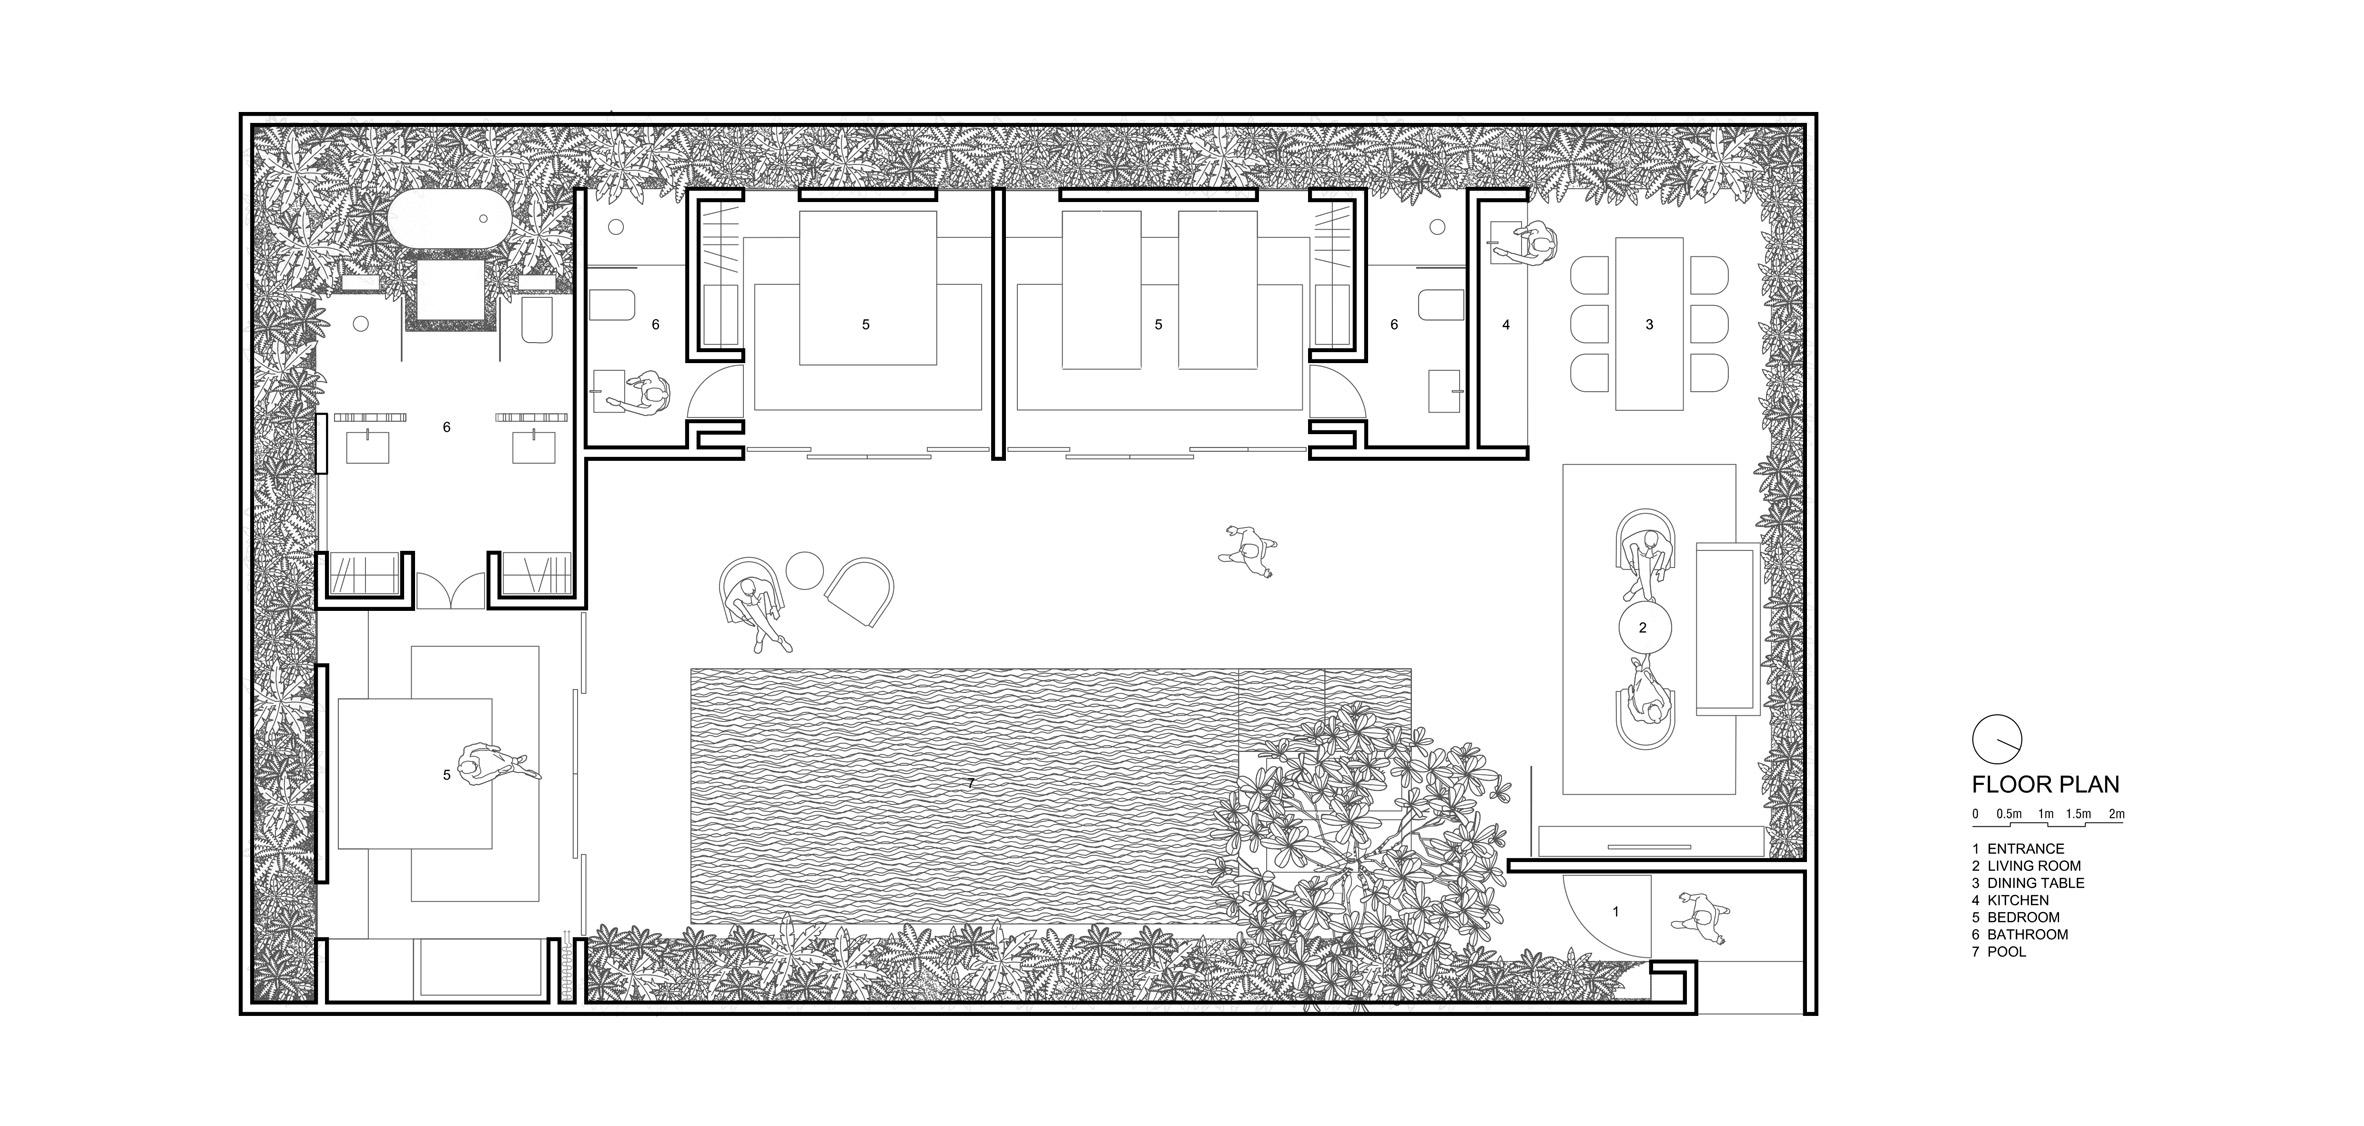 Wyndham Garden Phu Quoc Mia Design Studio Villa Plans Sections 02 Livin Spaces